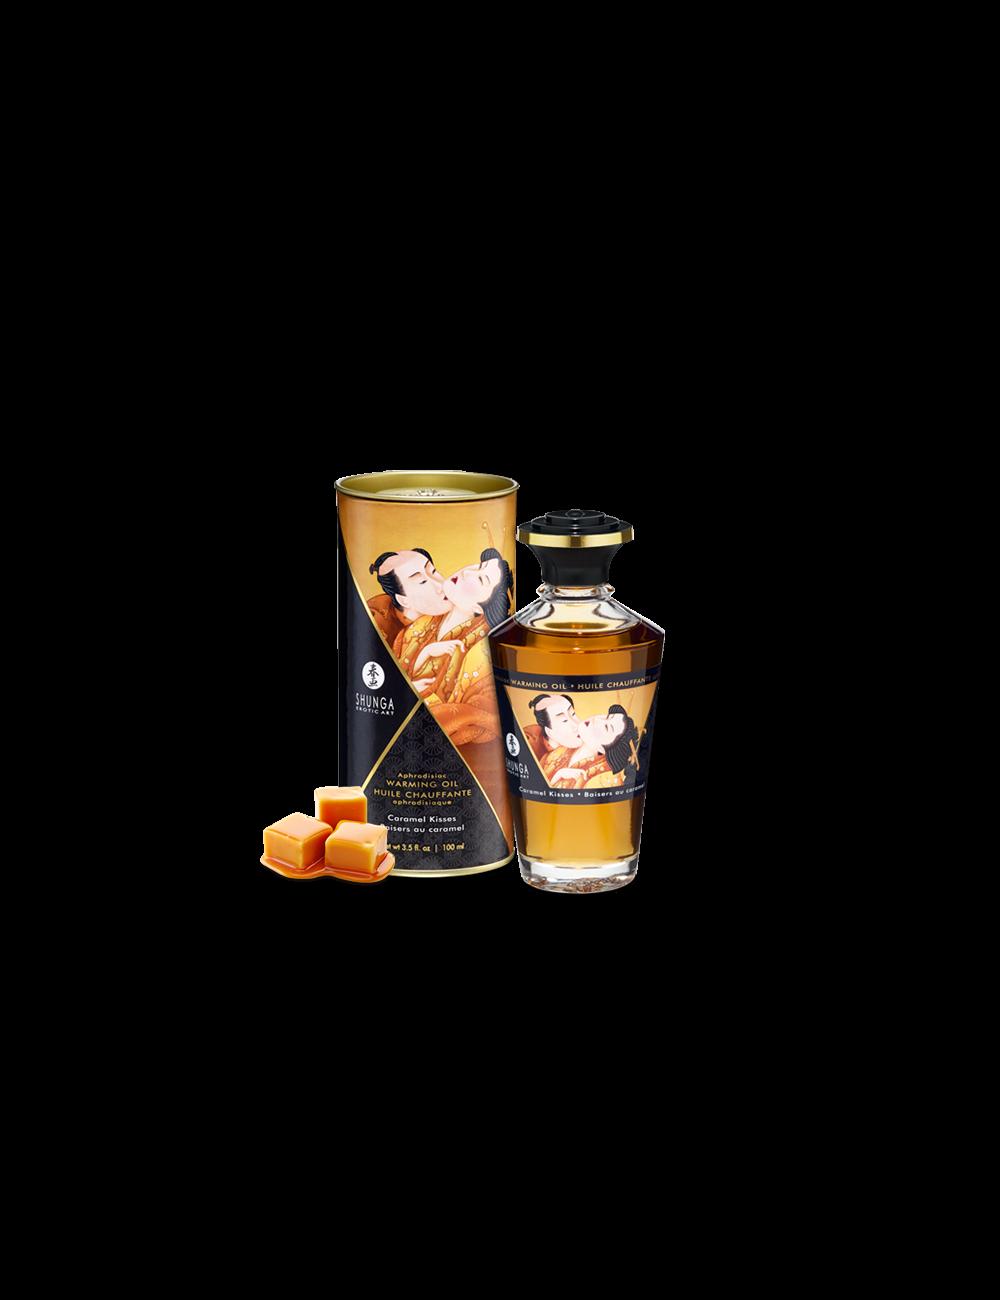 Huile chauffante aphrodisiaque - Baisers caramel - Huiles de massage - Shunga